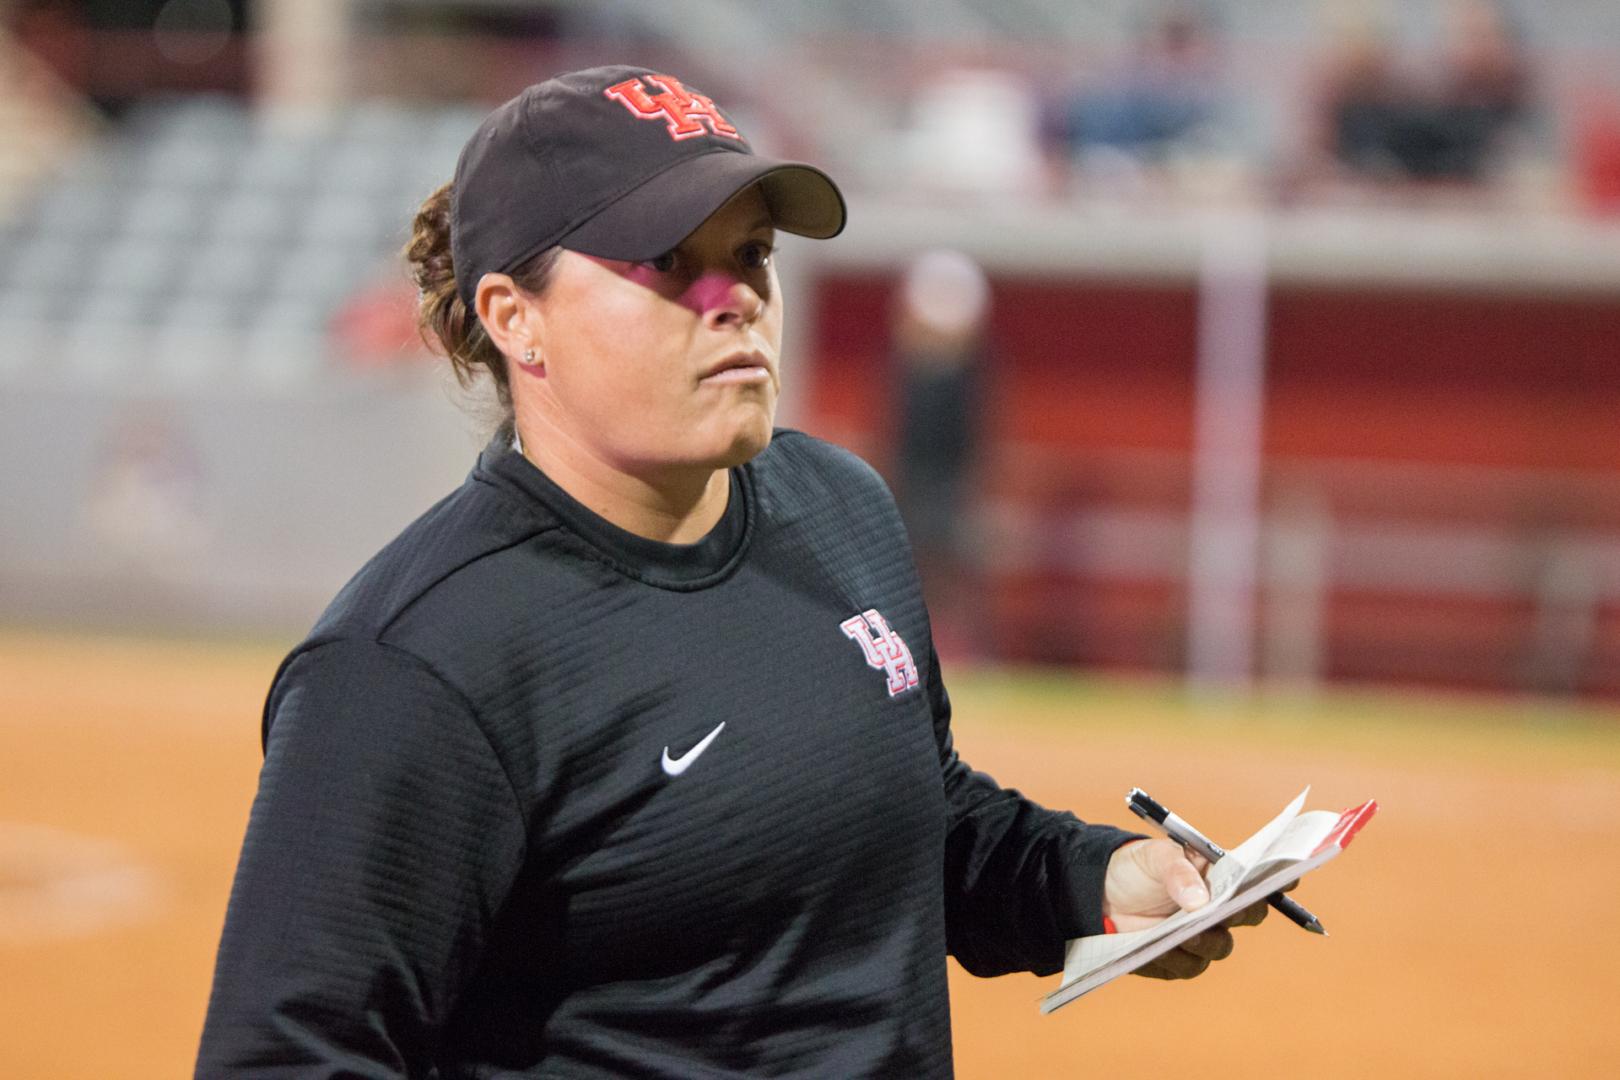 Softball head coach Kristin Vesely had led the Cougars to three 30-win campaigns before the 2020 season | Katrina Martinez/The Cougar